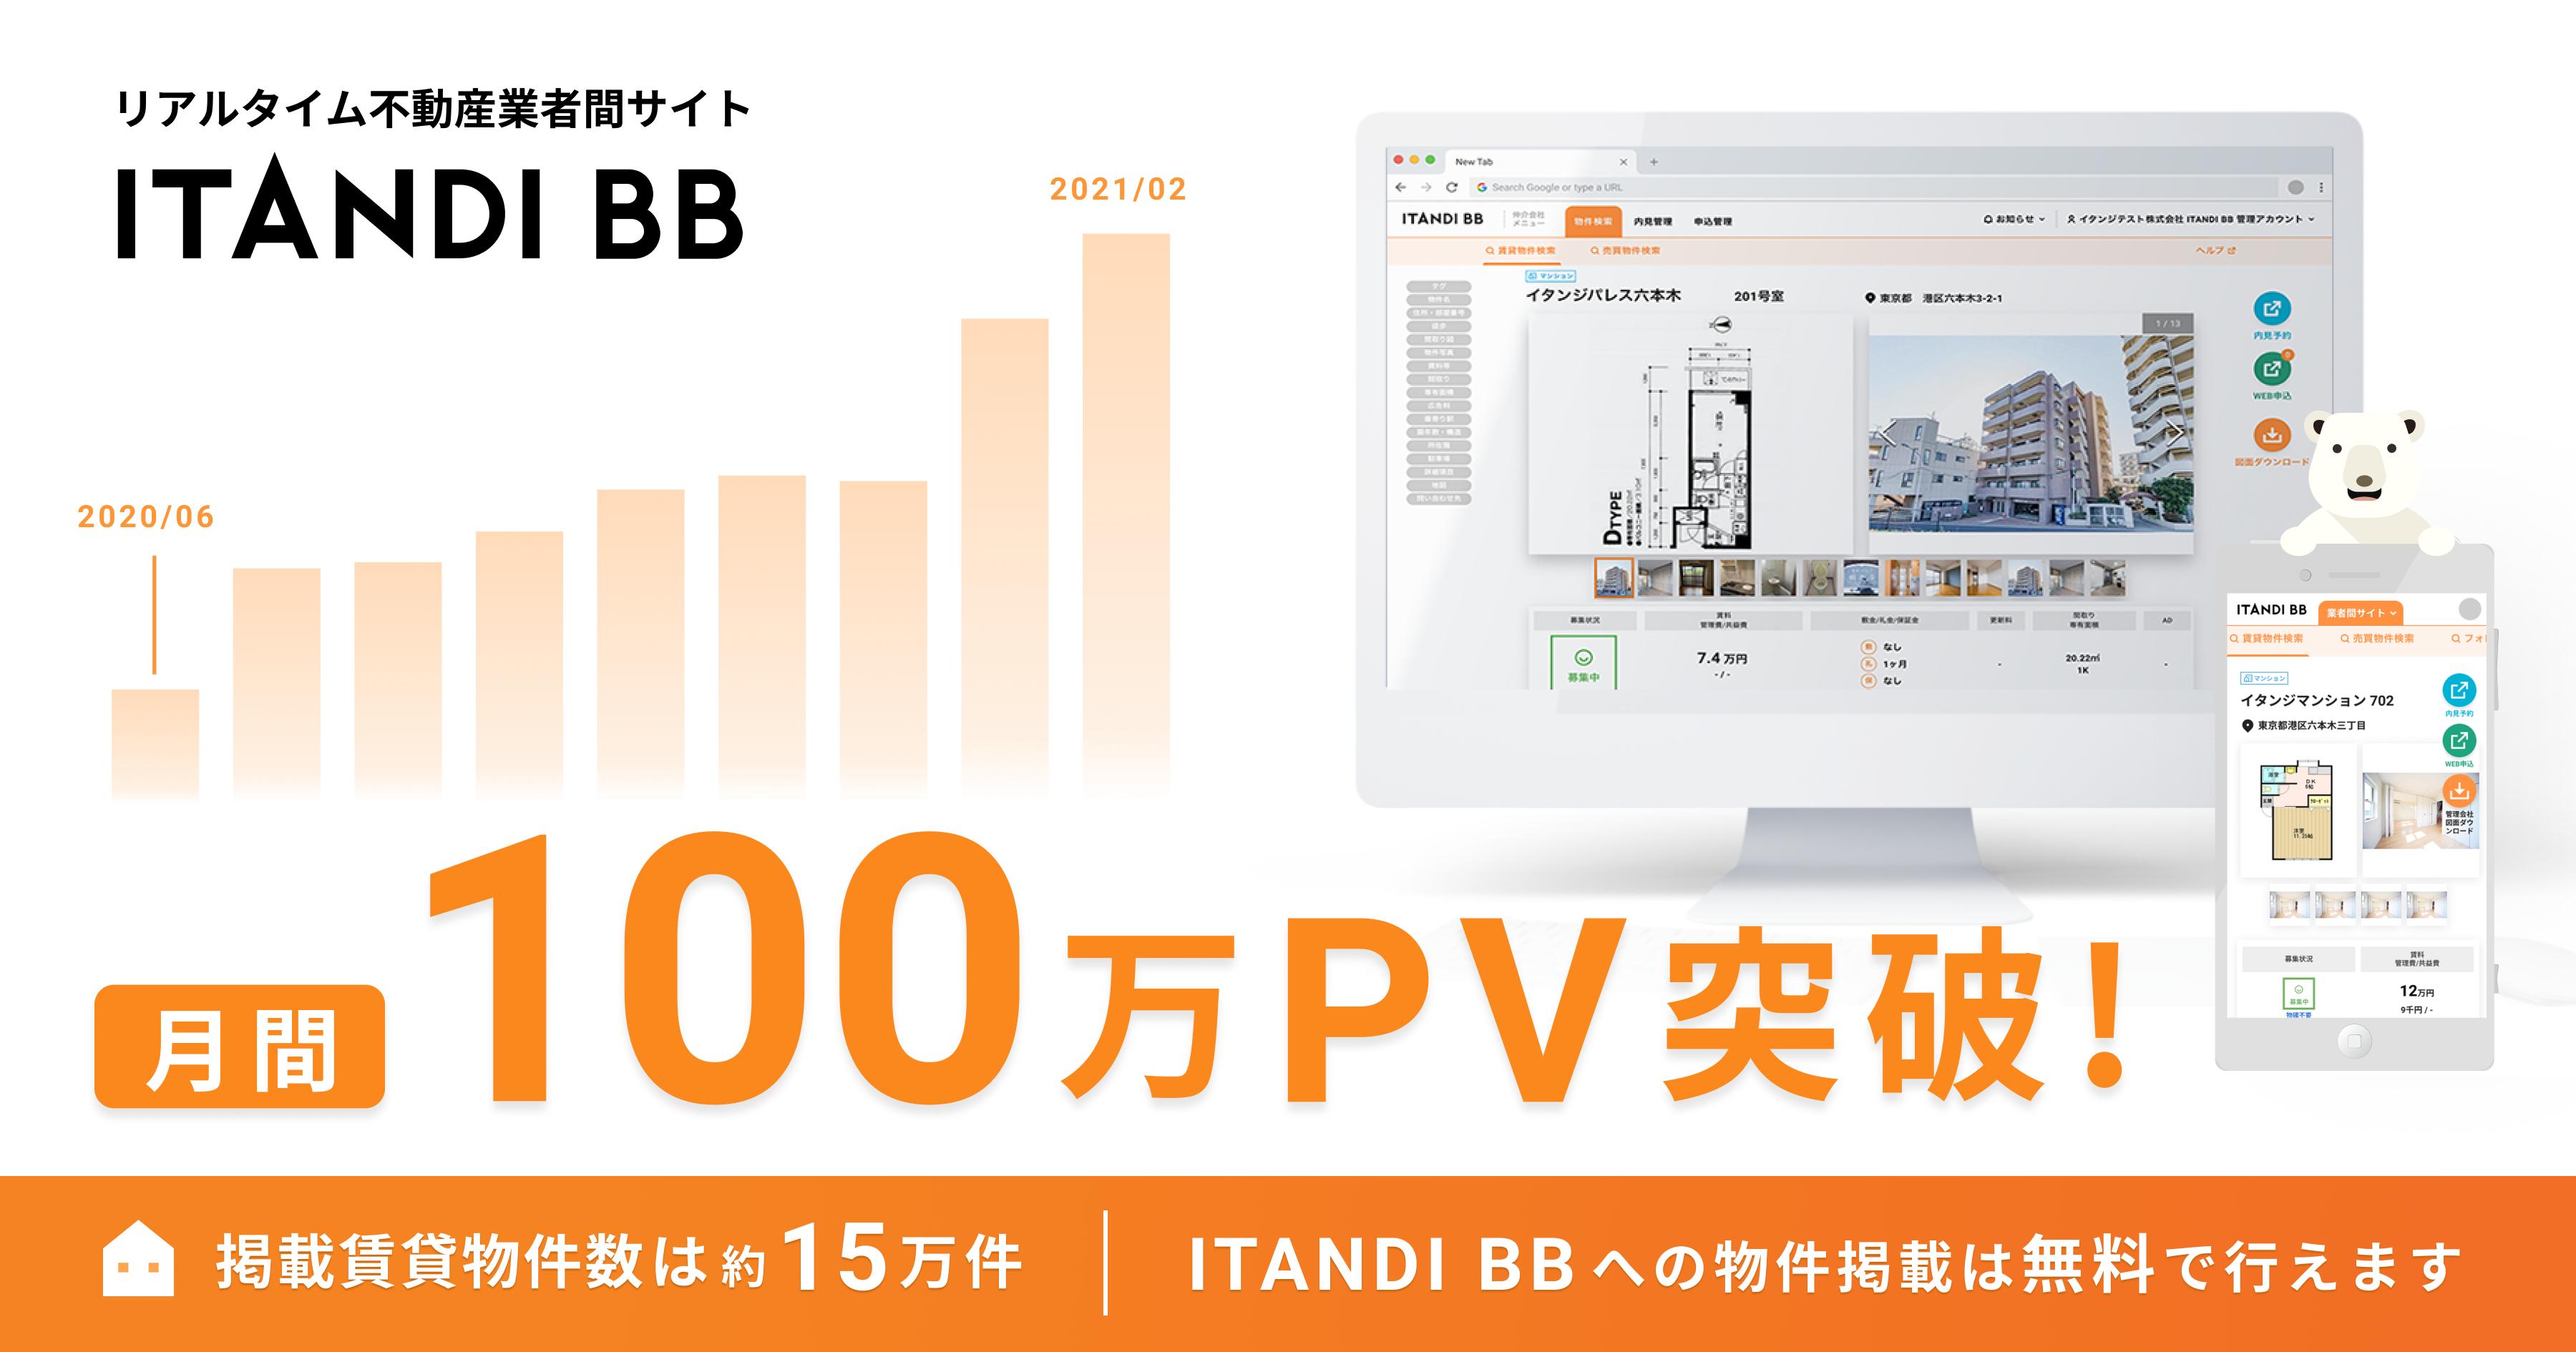 「ITANDI BB」のリアルタイム不動産業者間サイト、アクセス月間100万PV突破